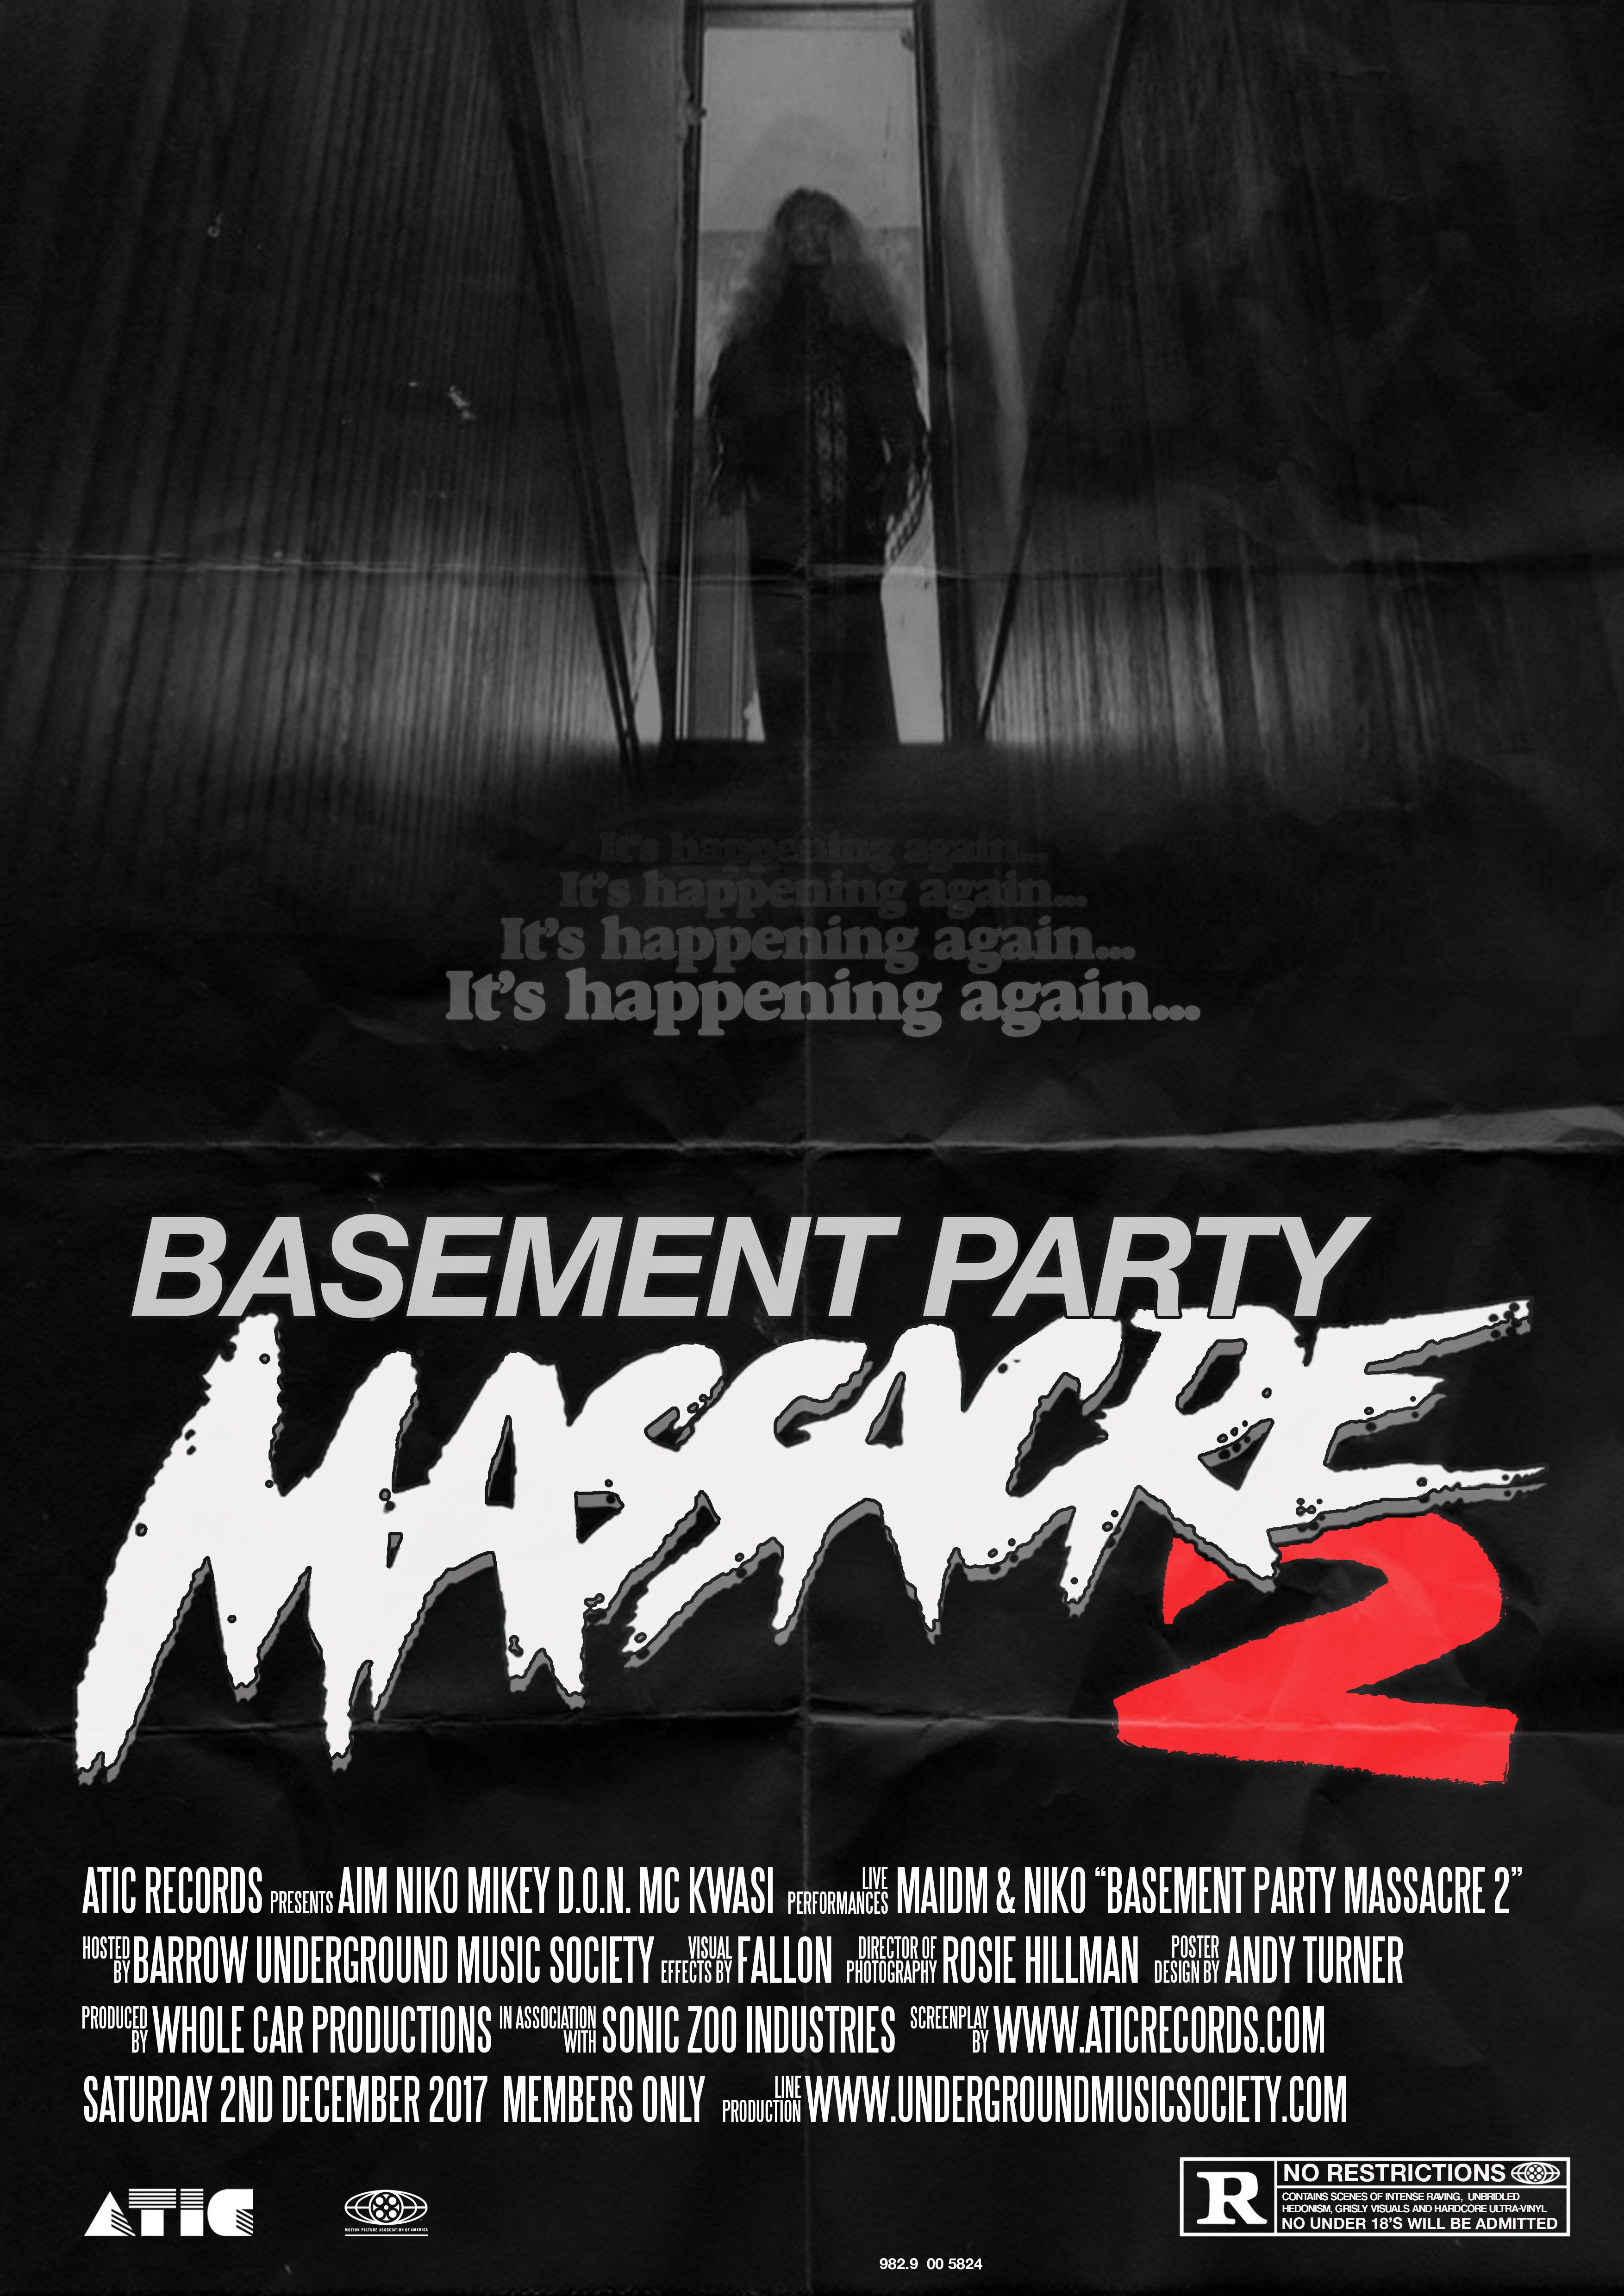 'BASEMENT PARTY MASSACRE 2' STARRING AIM, NIKO, MIKEY D.O.N. & MC KWASI